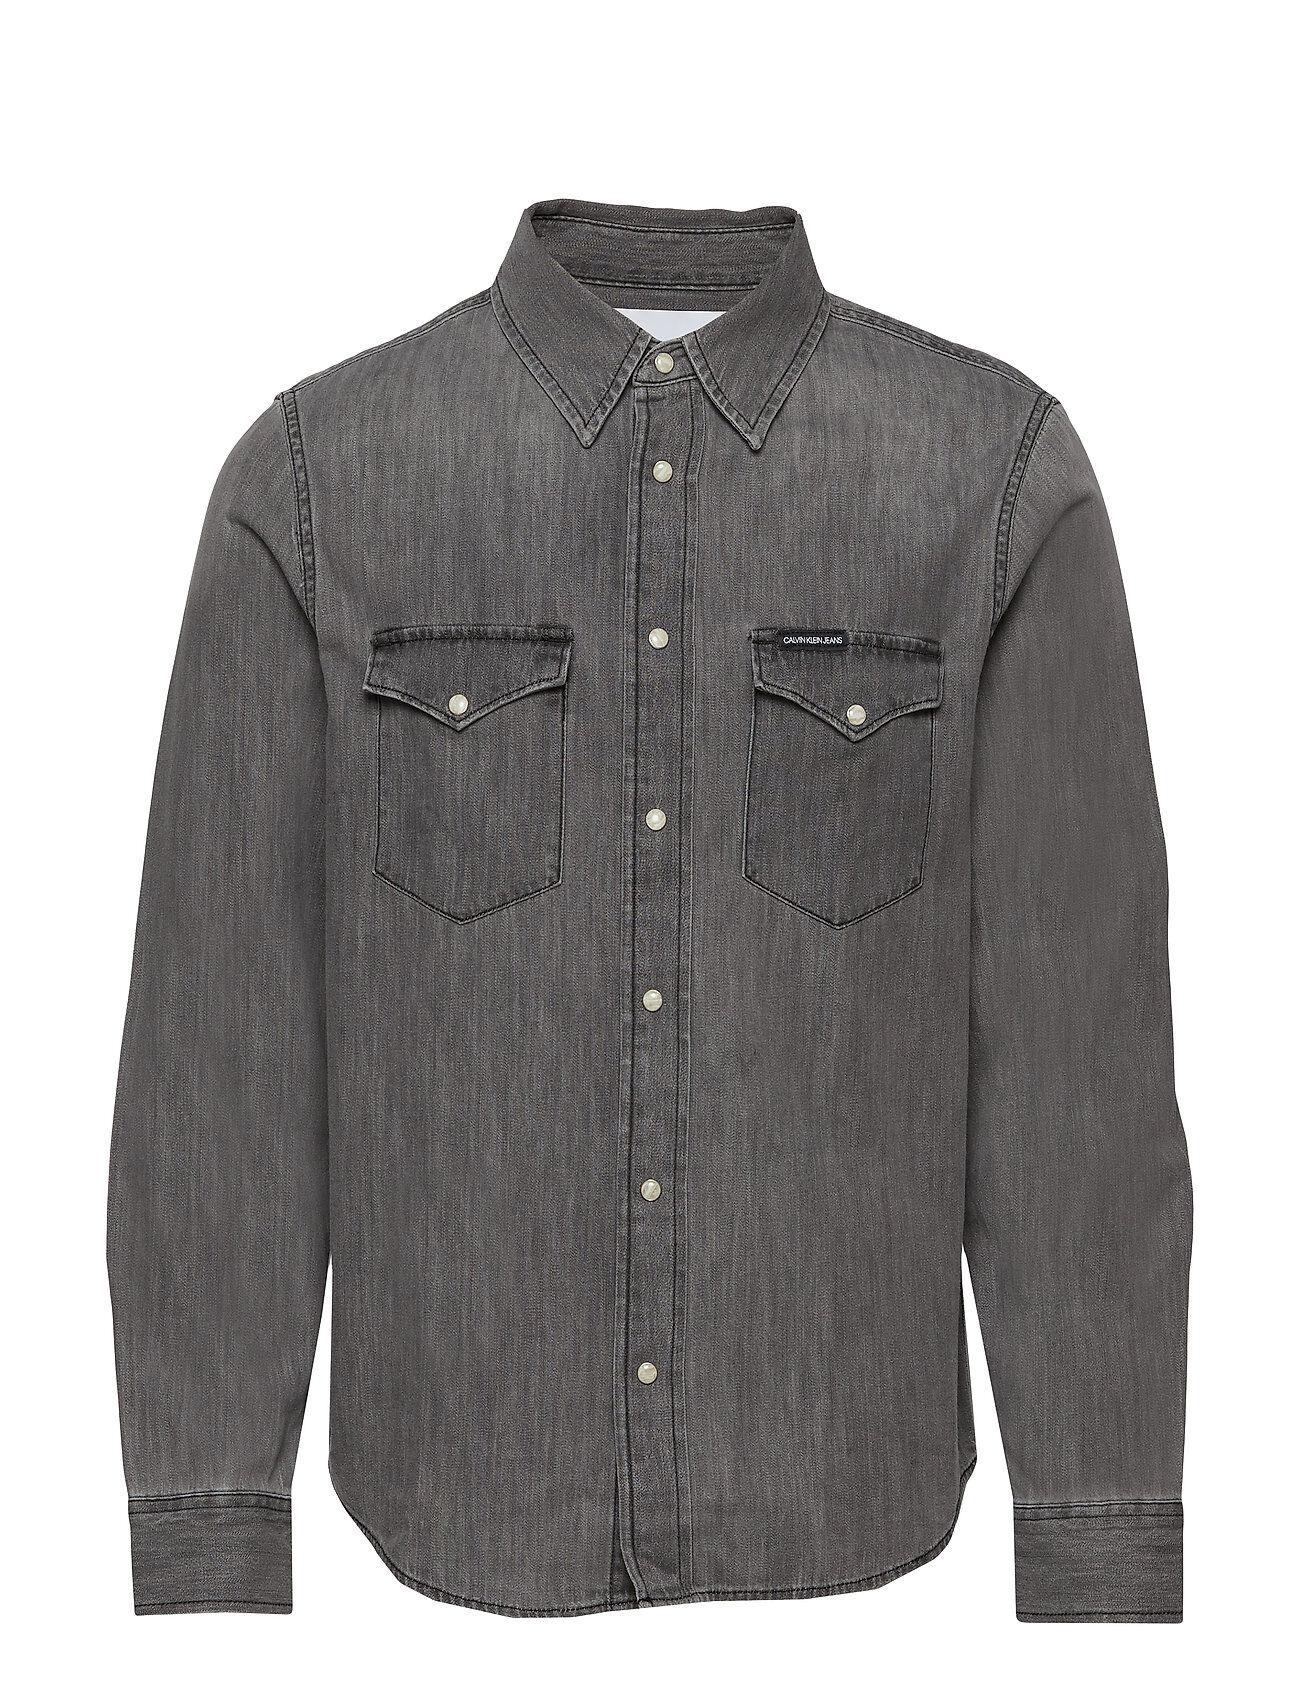 Image of Calvin Modern Western Shirt Paita Rento Casual Harmaa Calvin Klein Jeans